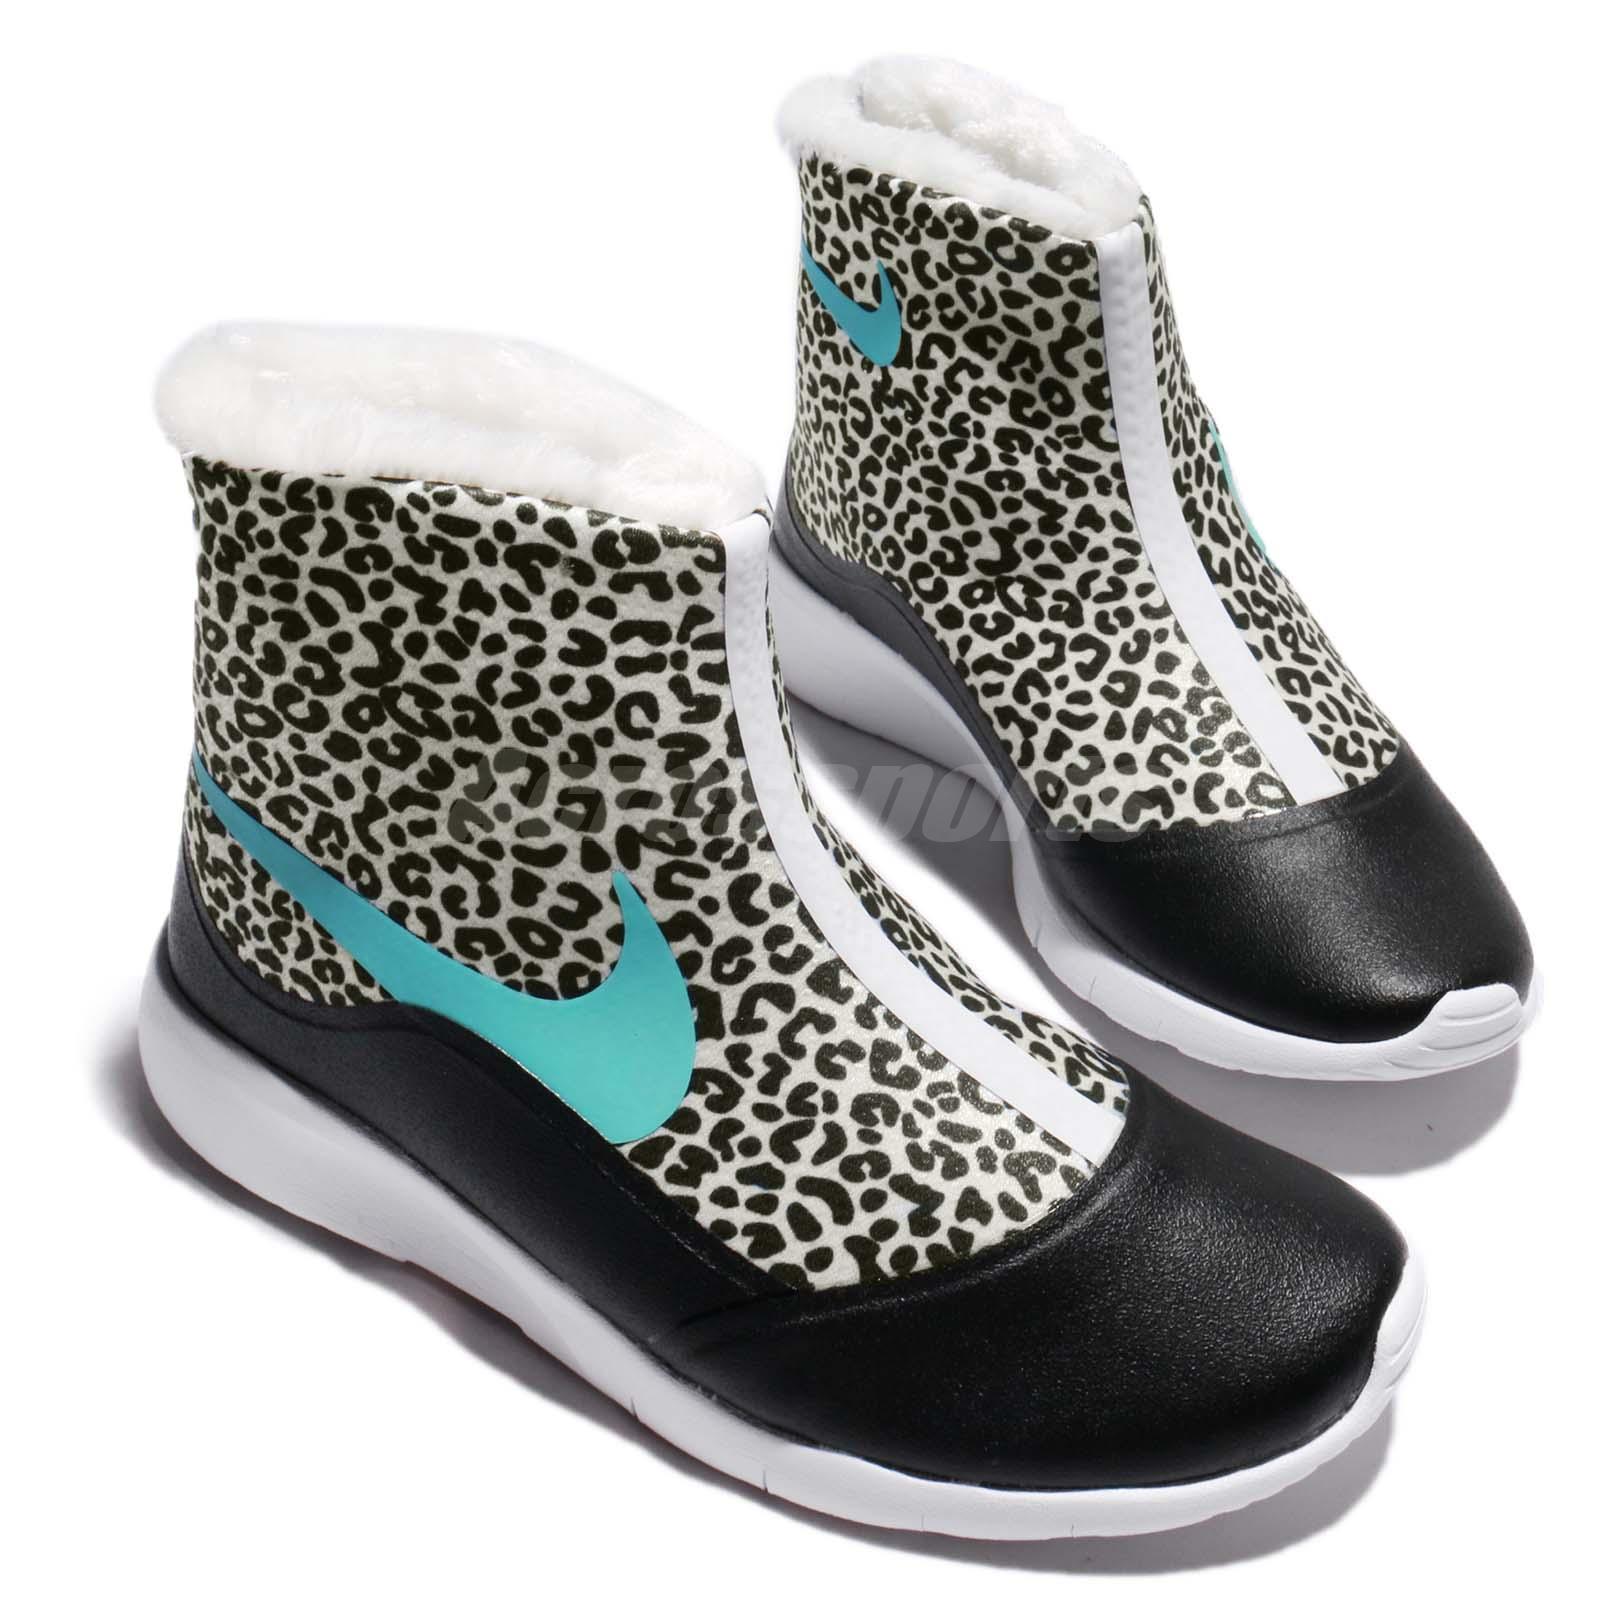 Nike Tanjun Hi Print GS White Light Aqua Black Kid High Boot Shoes AA2891-100